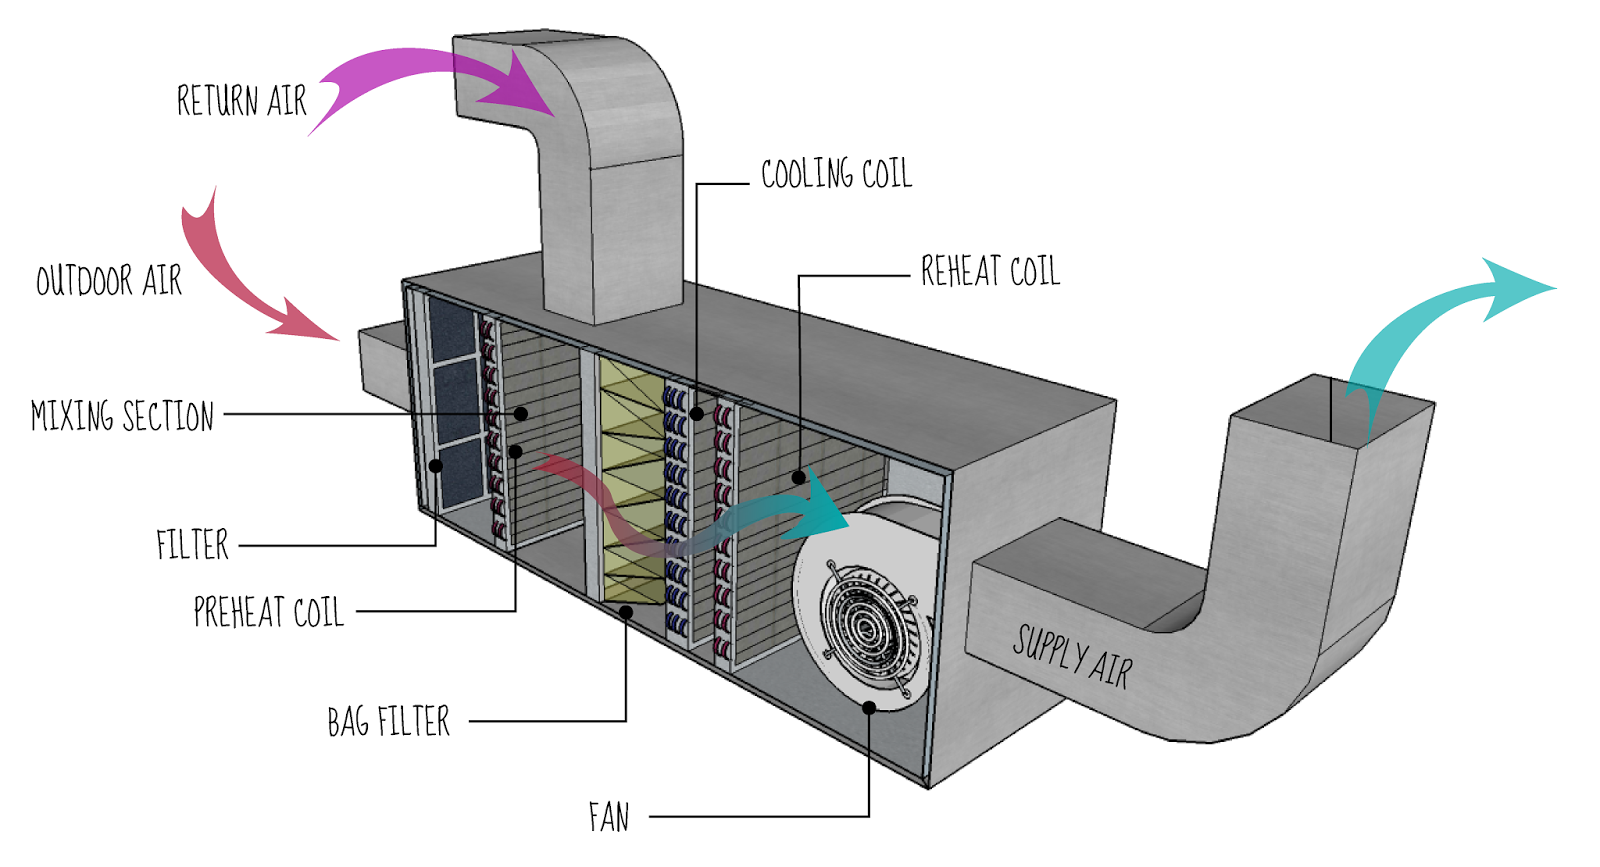 basic principles of a hvac system engineering updates rh teenknowlege blogspot com commercial hvac diagram hvac plenum diagram [ 1600 x 867 Pixel ]